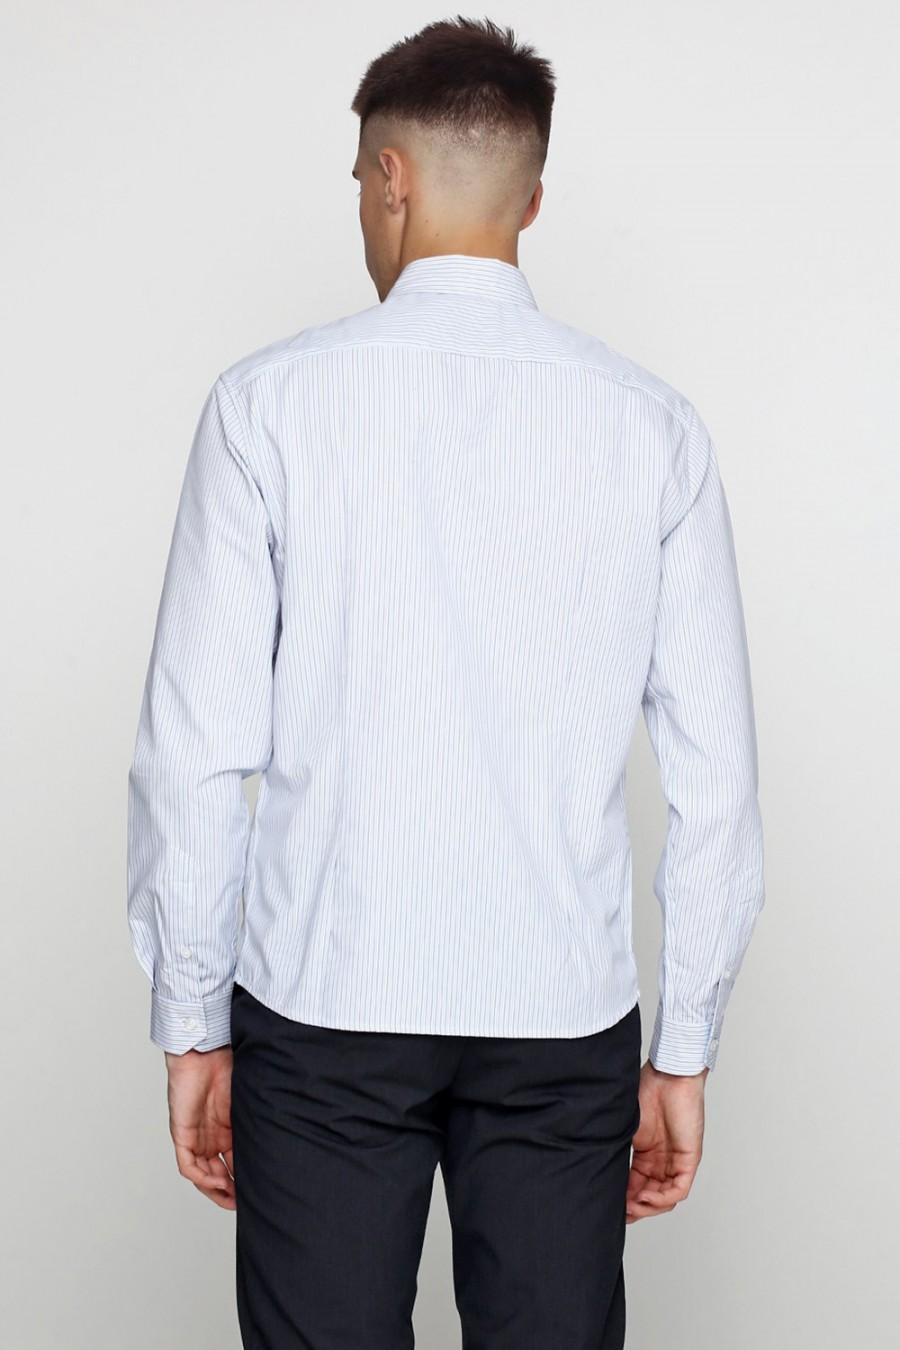 Мужская рубашка S-119-13